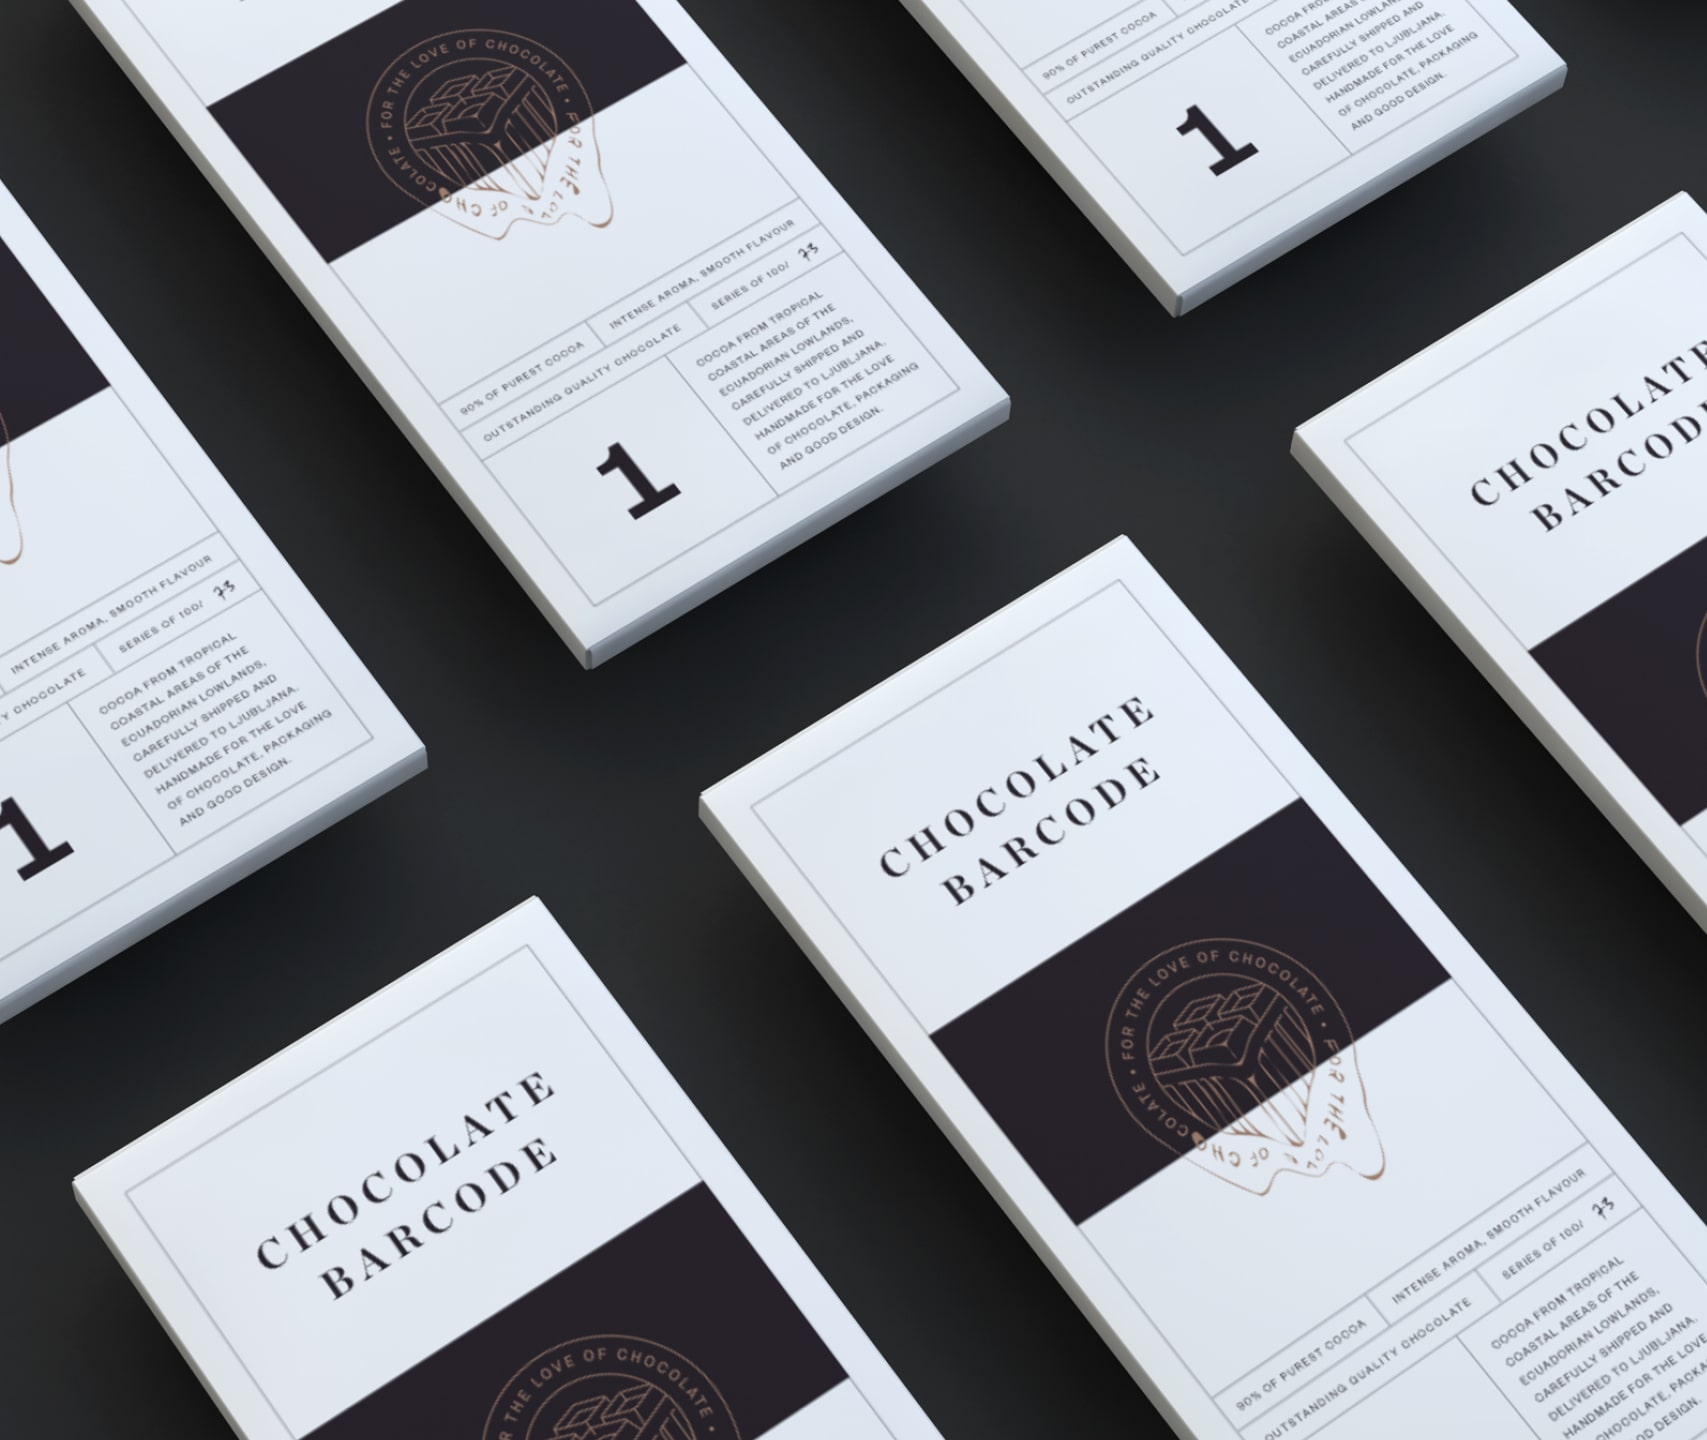 mantik-digital-branding-development-agency-chocolate-packaging-webdesign-design-6-min